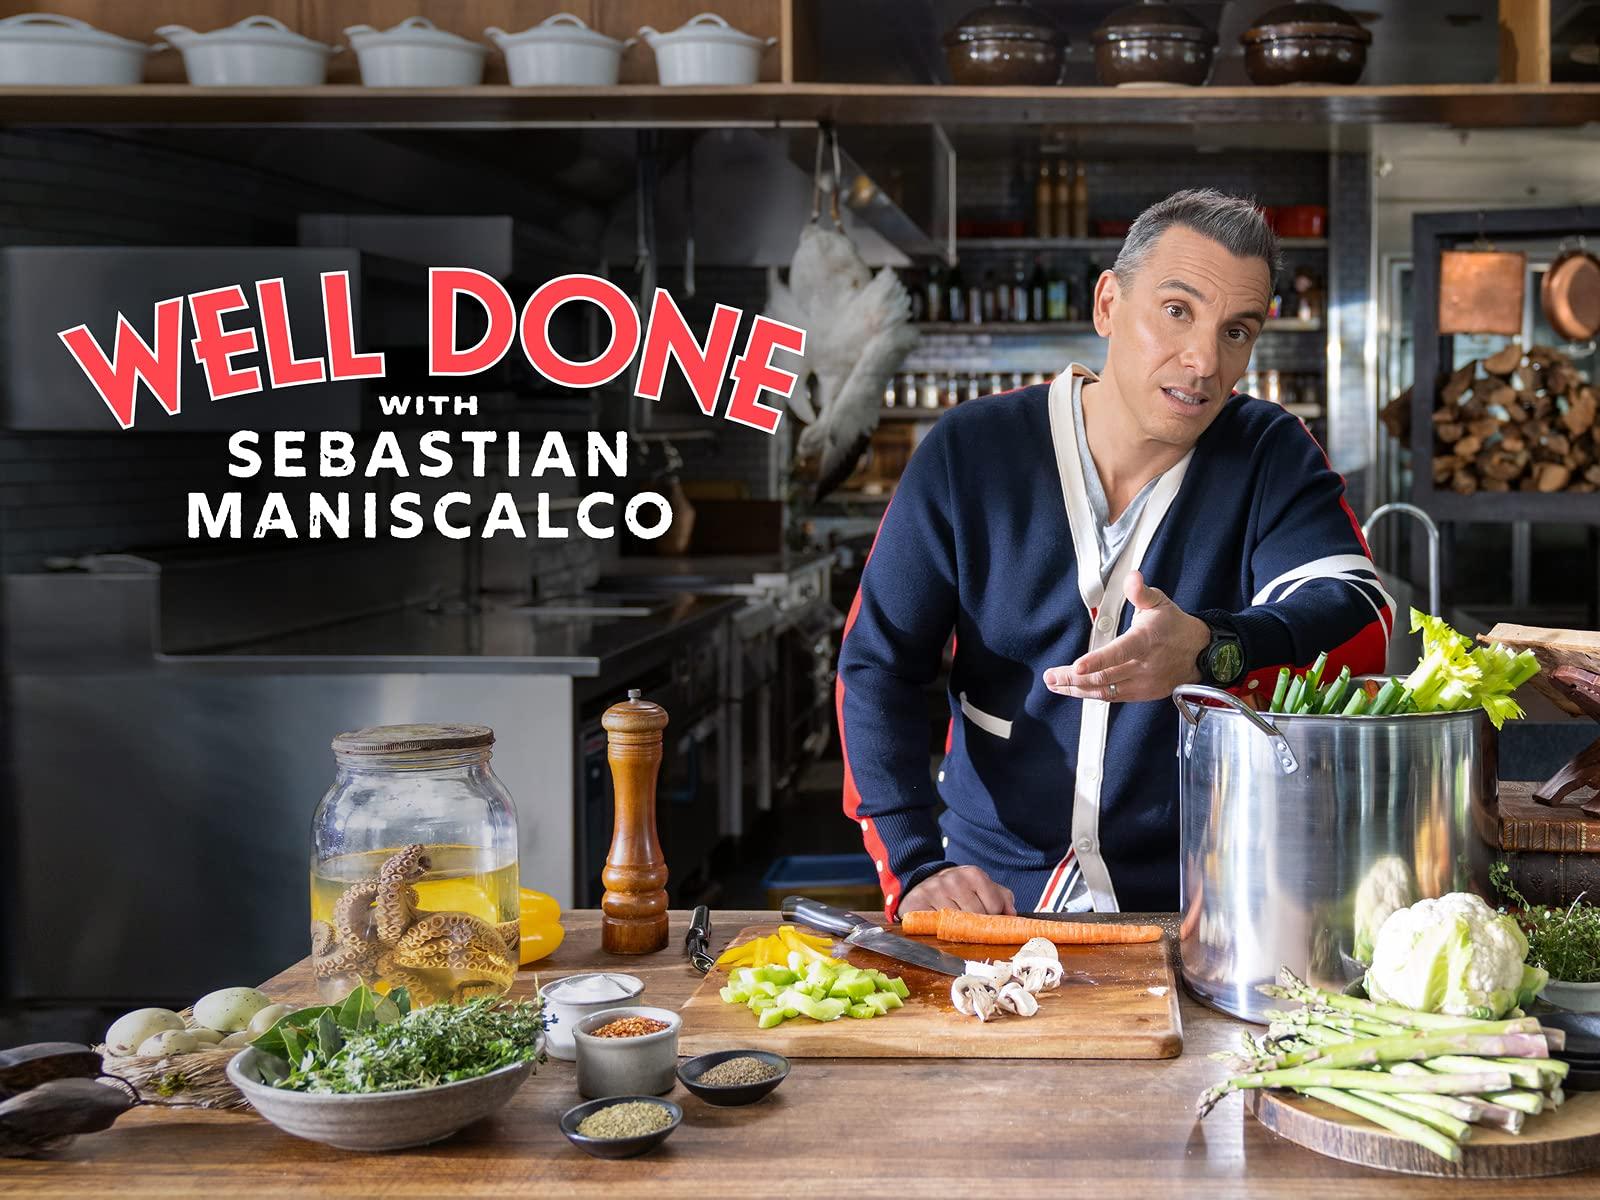 Watch Well Done with Sebastian Maniscalco - Season 8 Prime Video